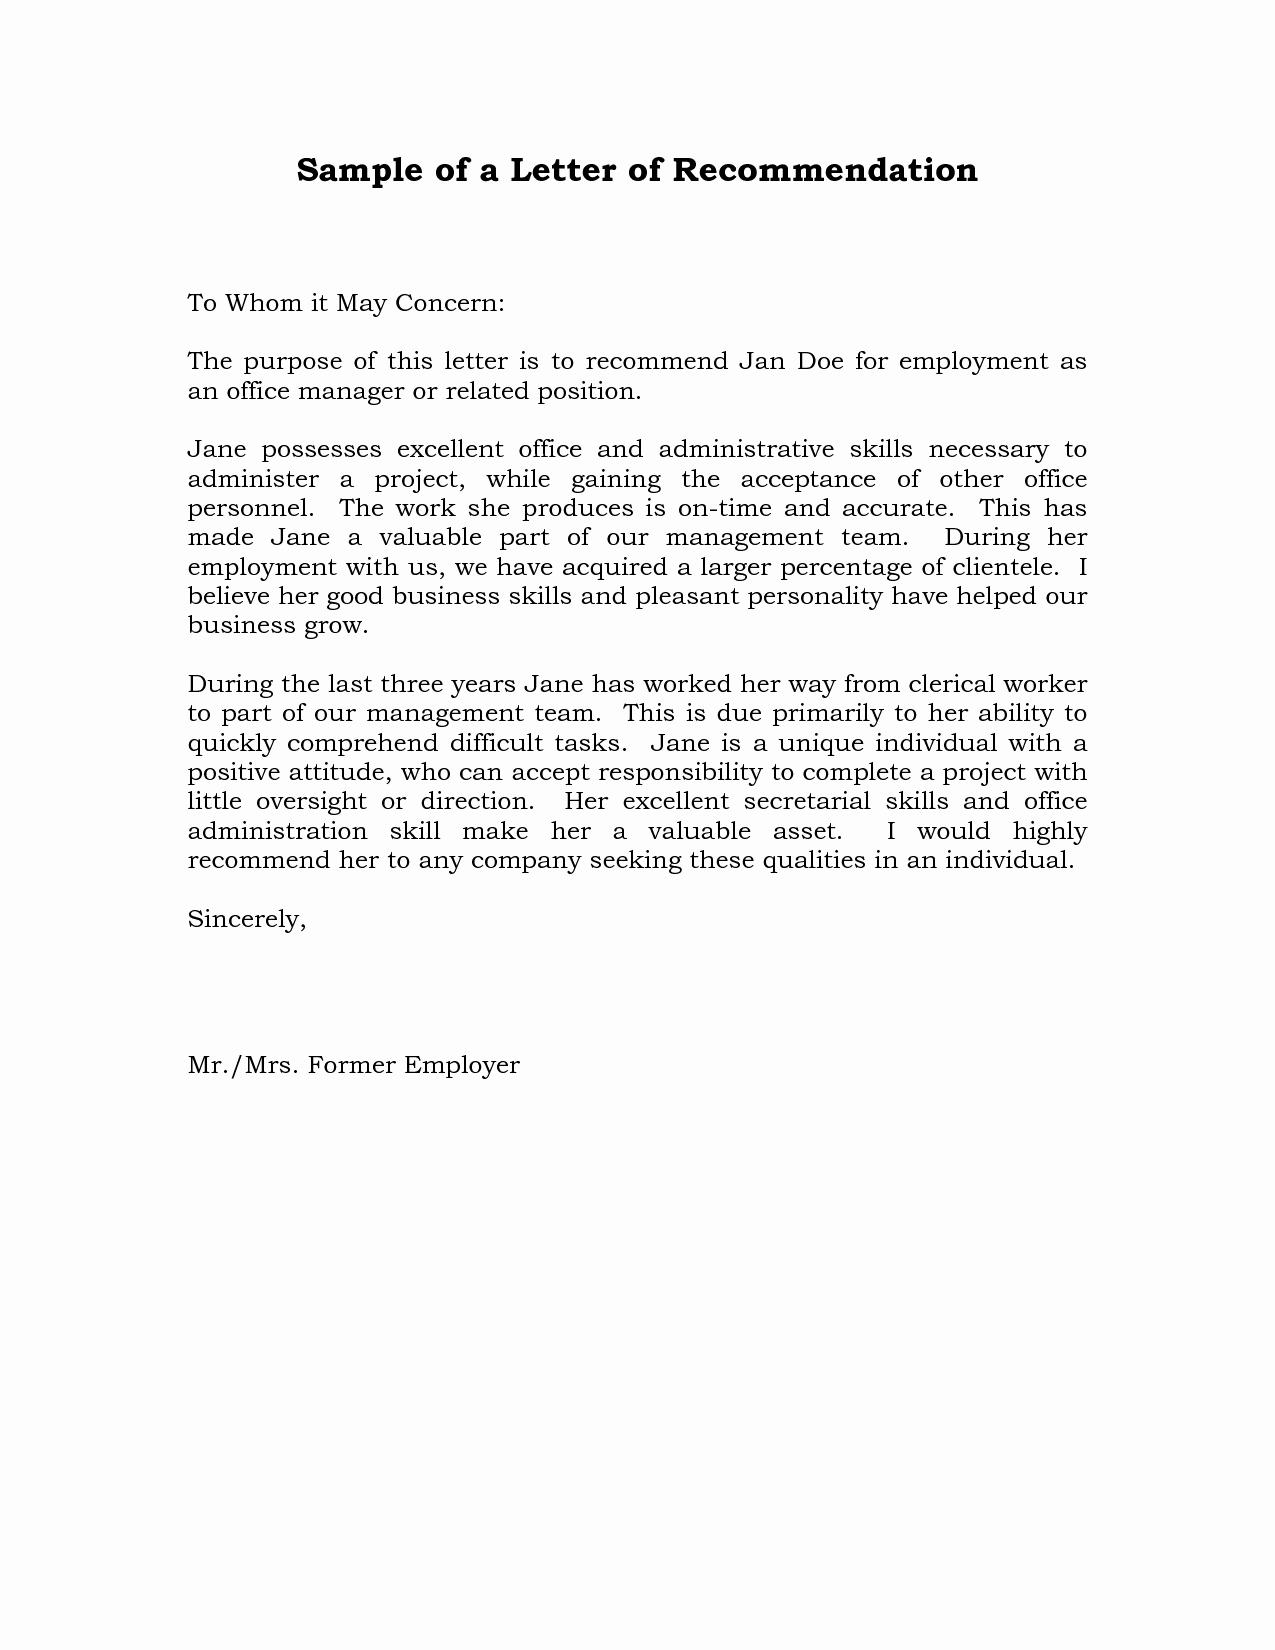 Letter Of Recommendation Letterhead Elegant Reference Letter Of Re Mendation Sample